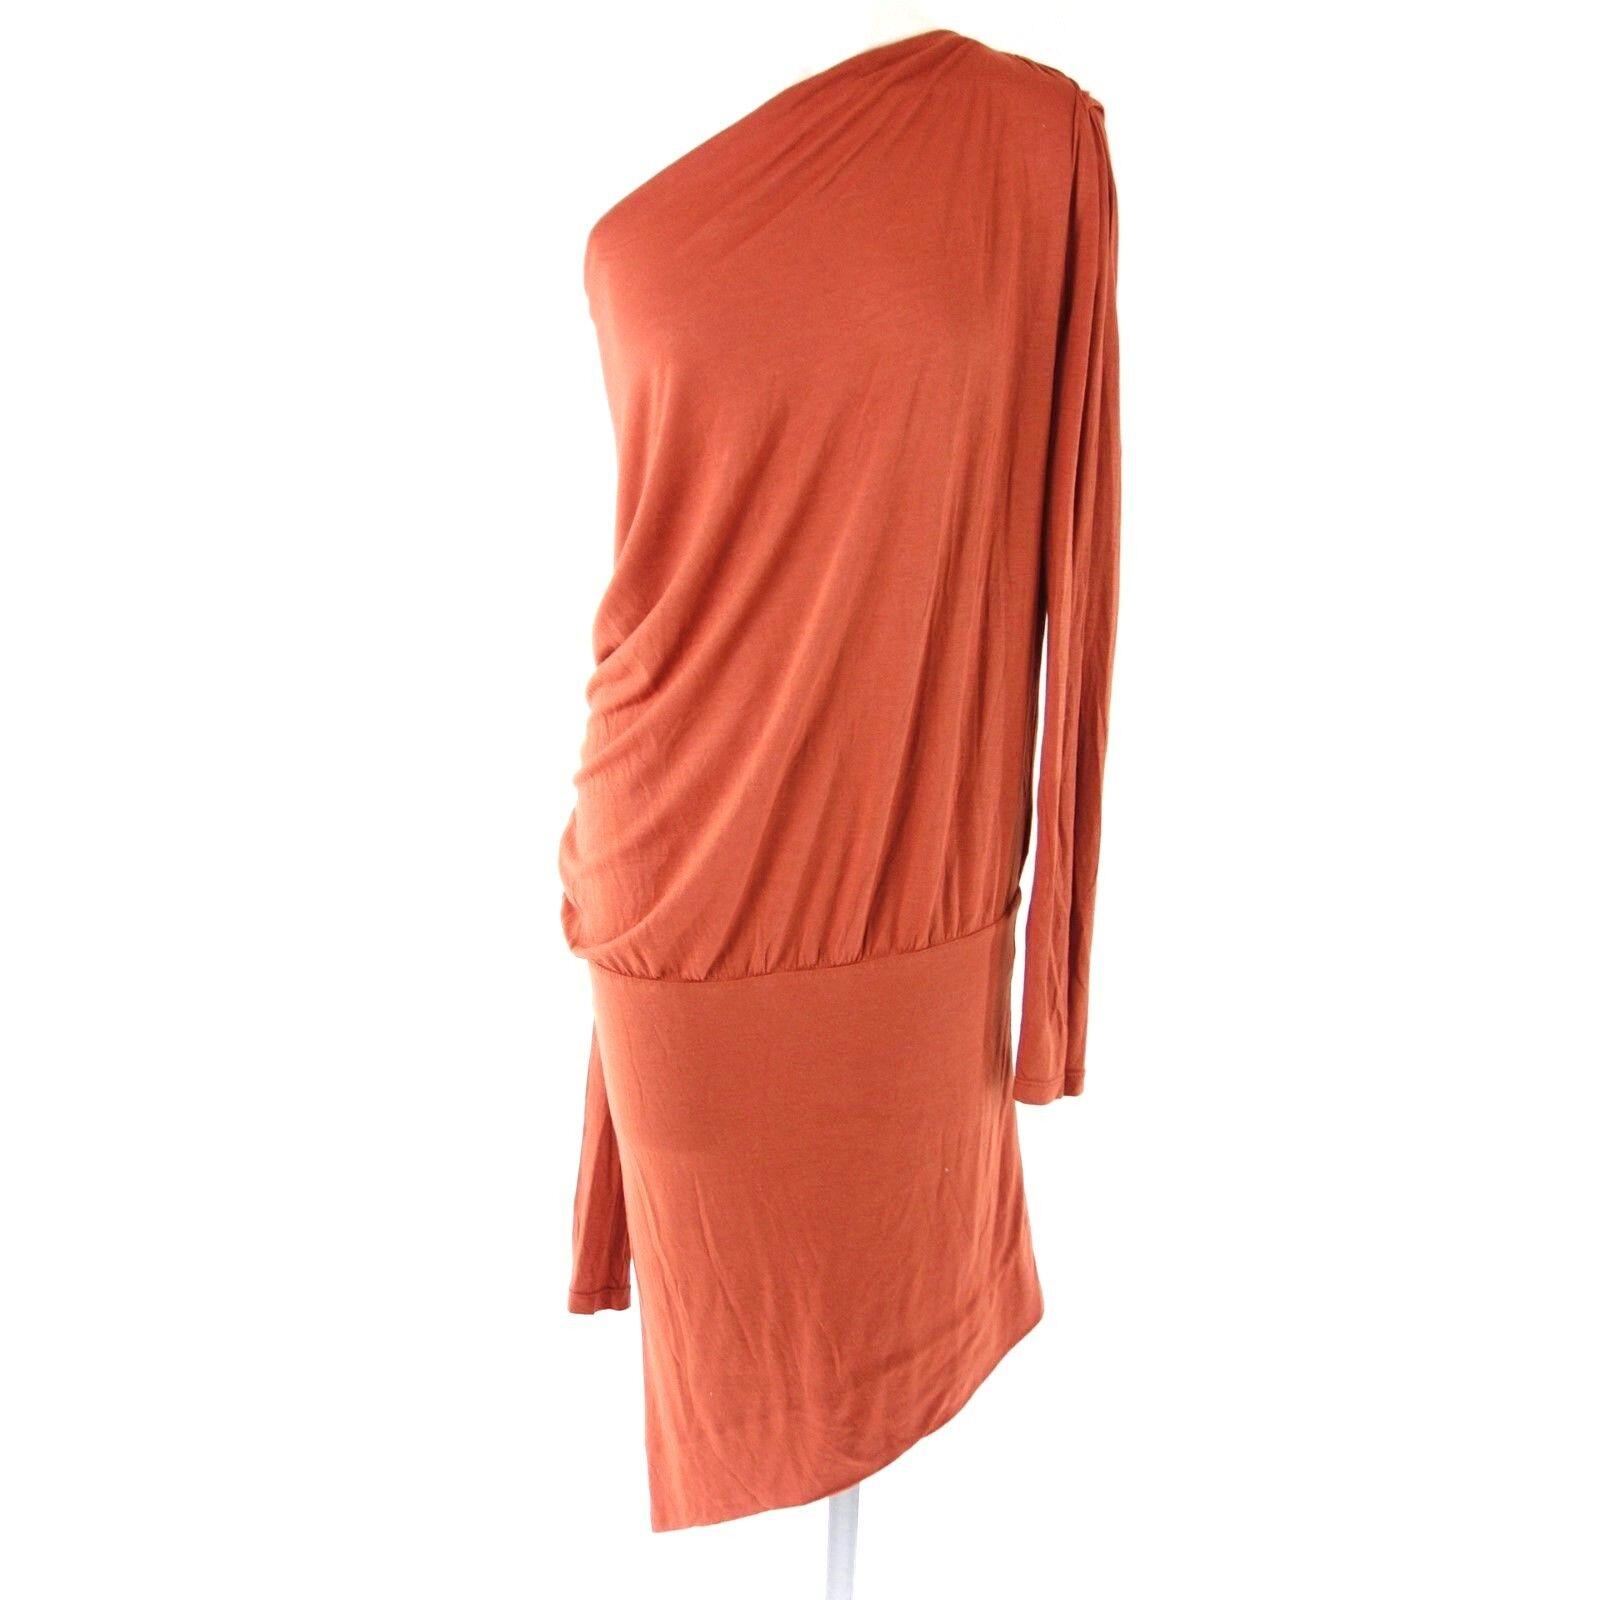 Deha Damen Jersey Kleid M 38 Rot One Shoulder Shirtkleid Modal Wolle Np 79 Neu